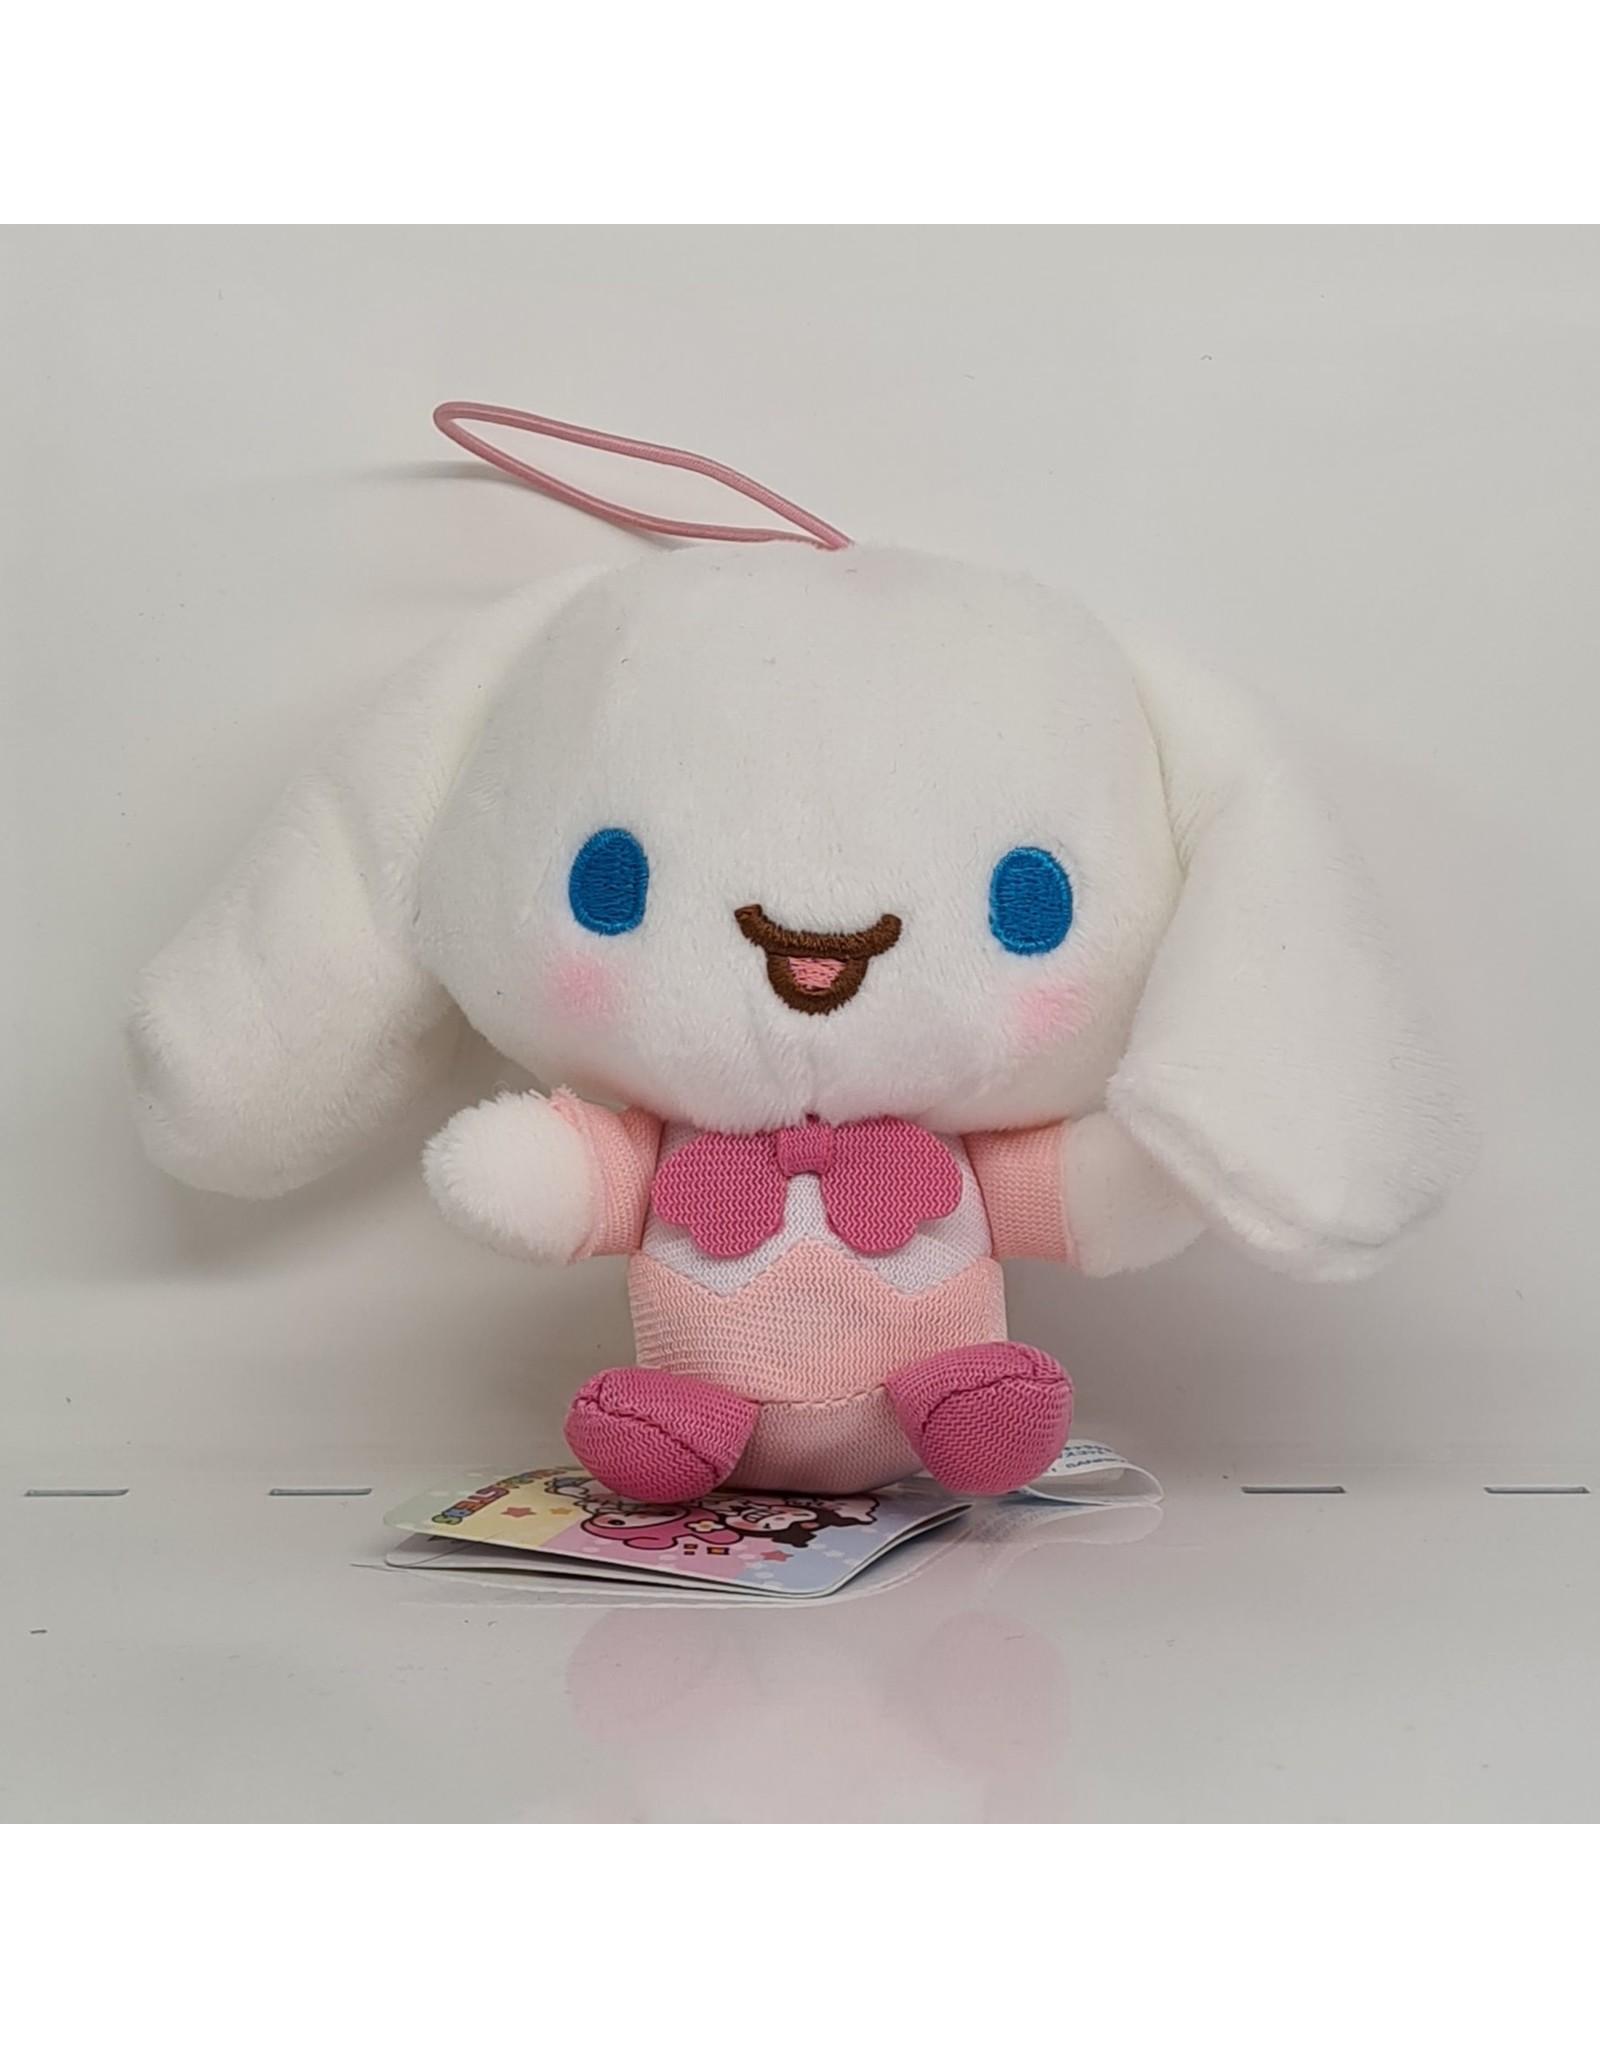 Sanrio Yurukawa Character Series Sakura Plush - Cinnamoroll - 10 cm